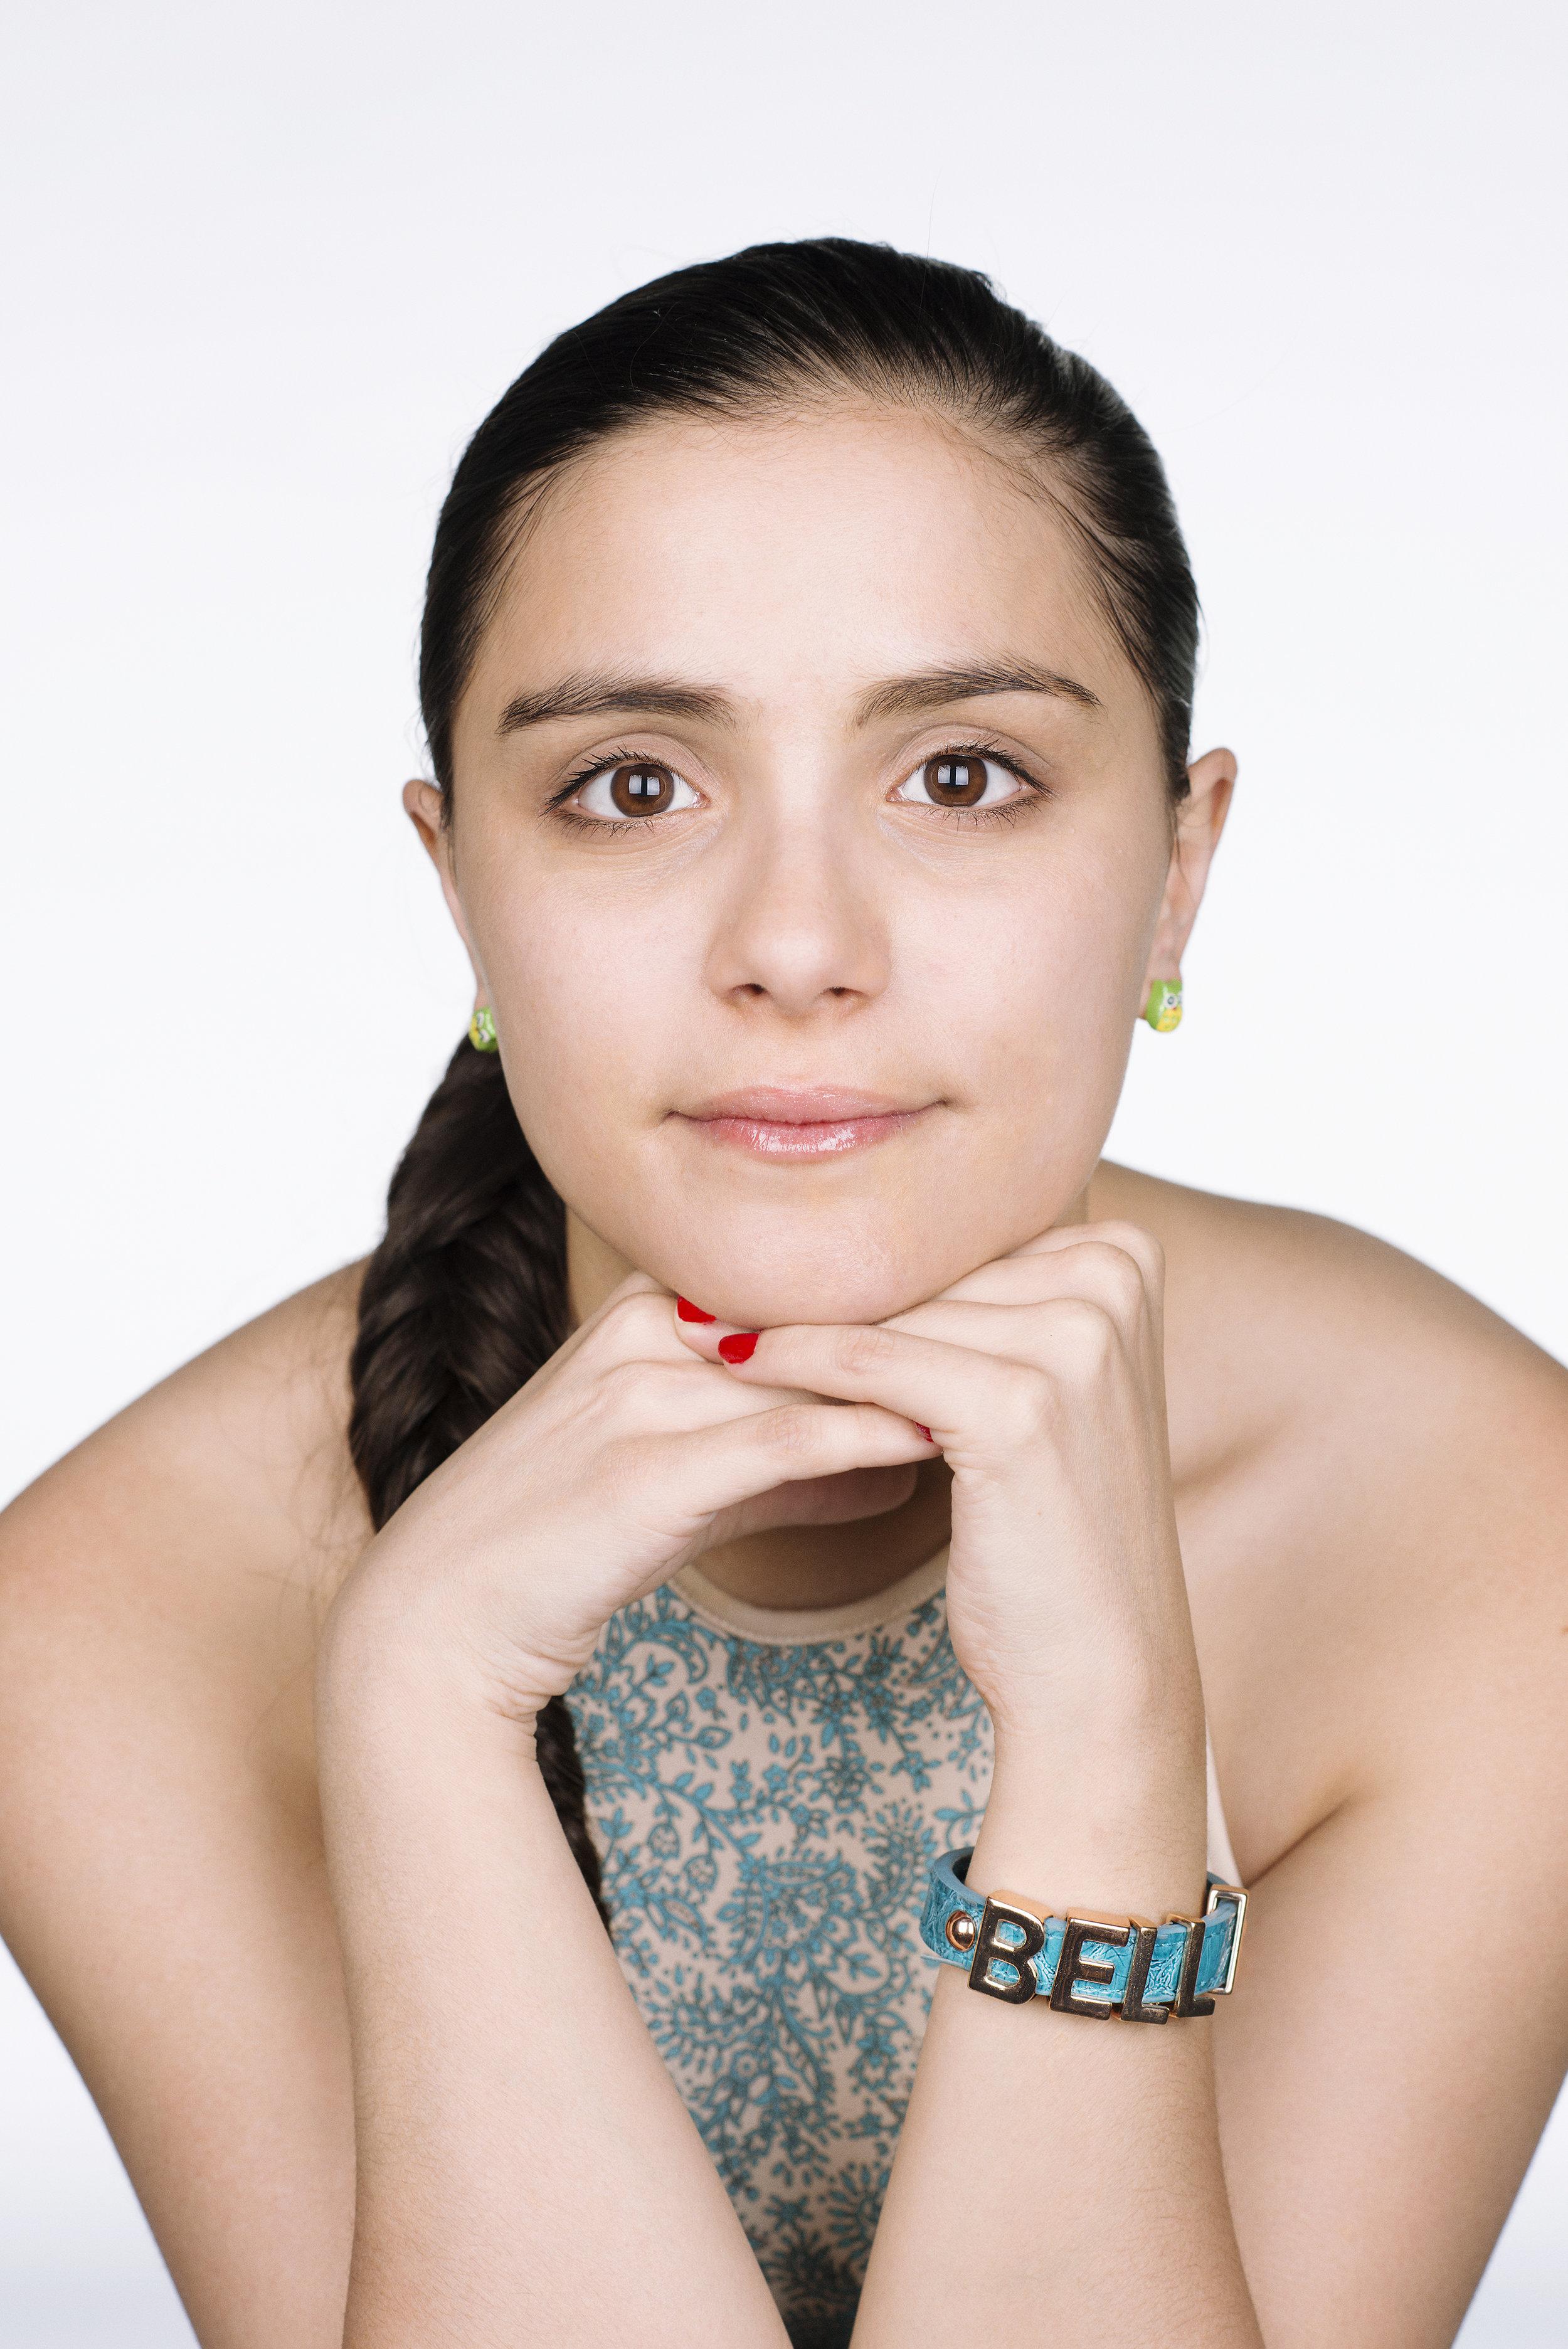 female_portrait.jpg